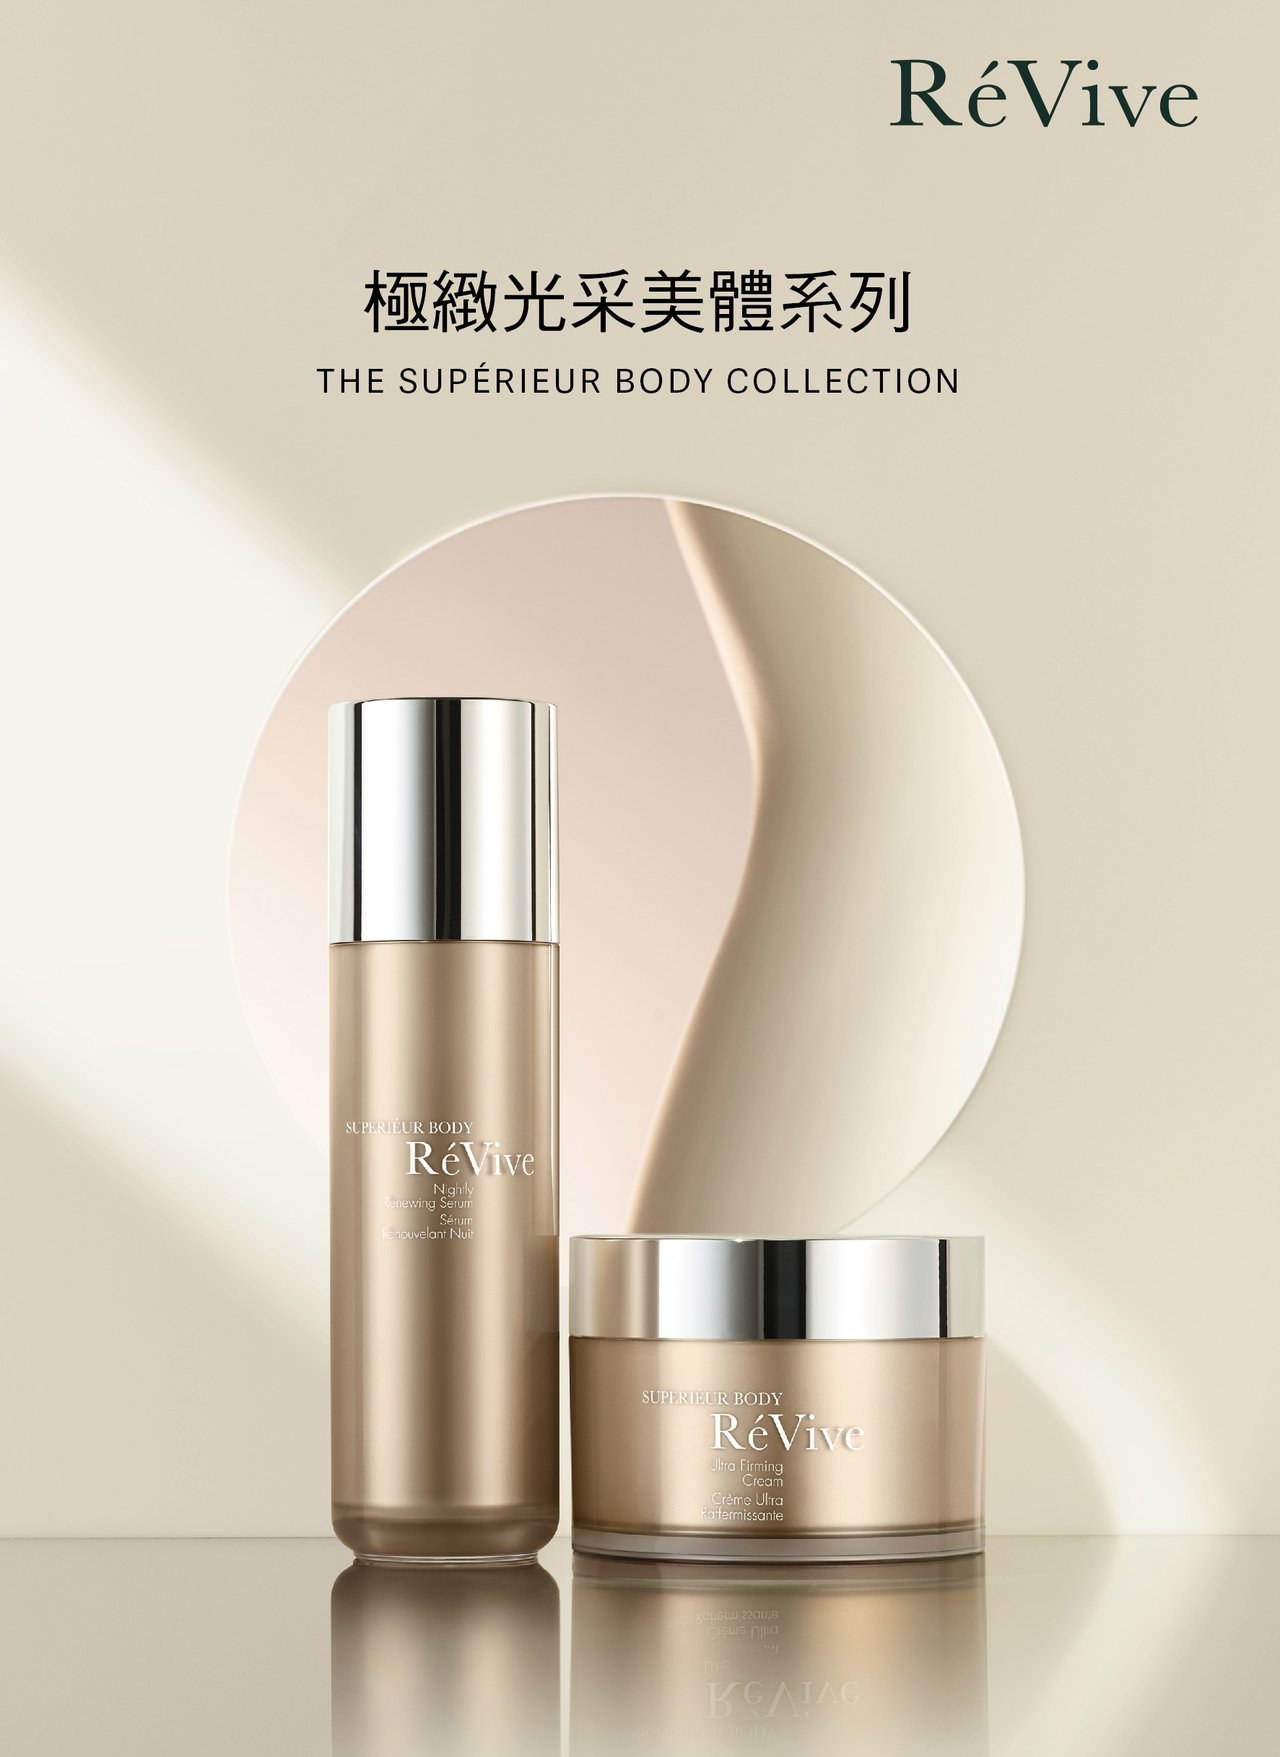 RéVive 4D活膚美體精華/120ml/7,800元(左)、RéVive 4...